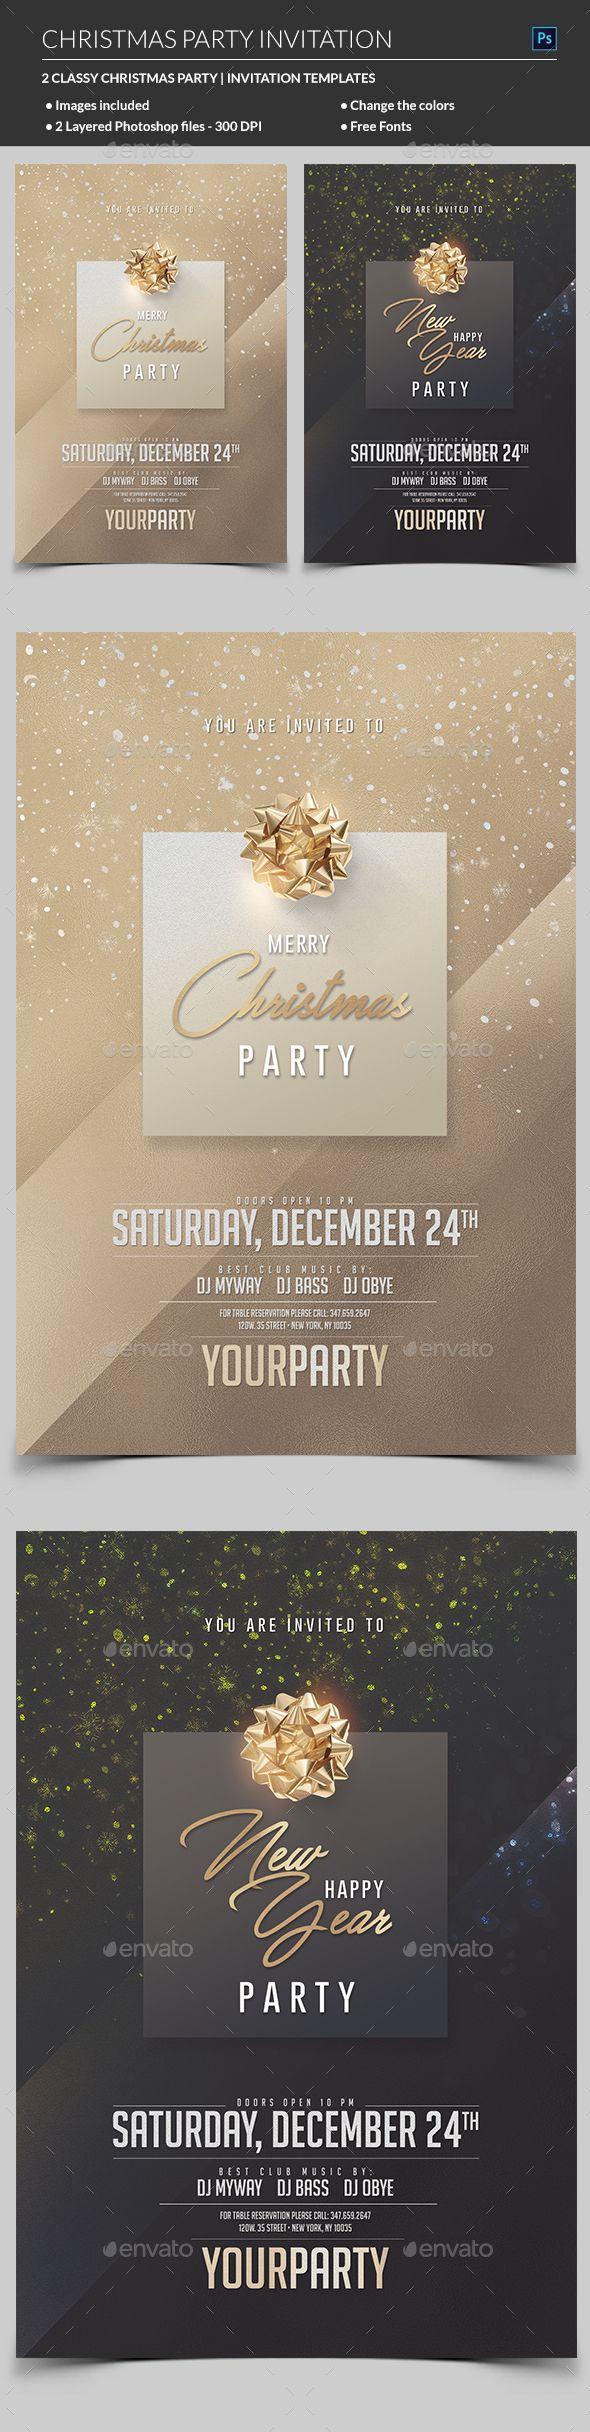 Best 25+ Christmas party invitation template ideas on Pinterest